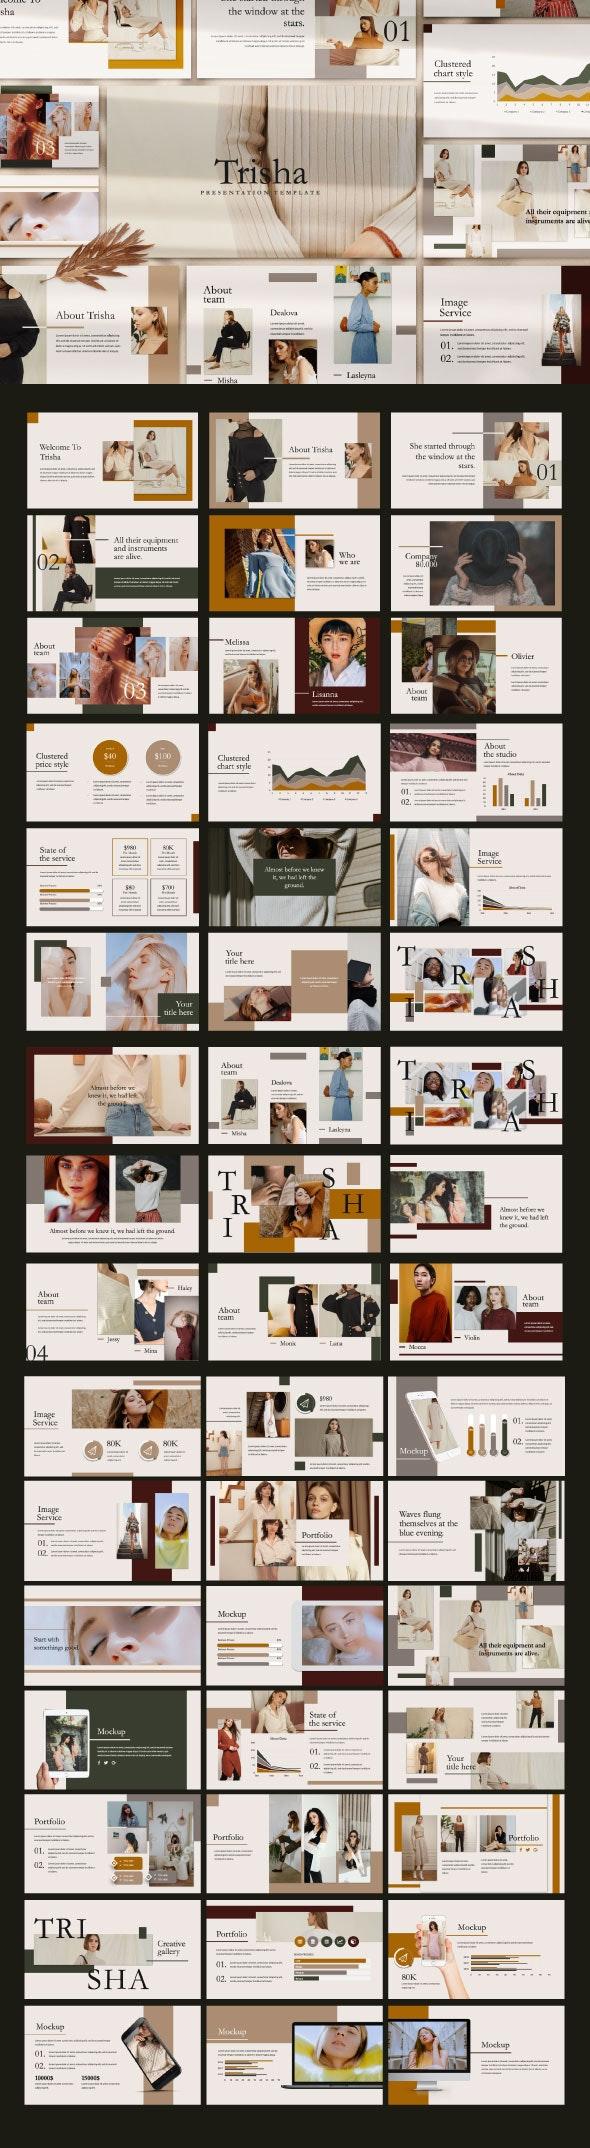 Trisha Powerpoint Template - Creative PowerPoint Templates